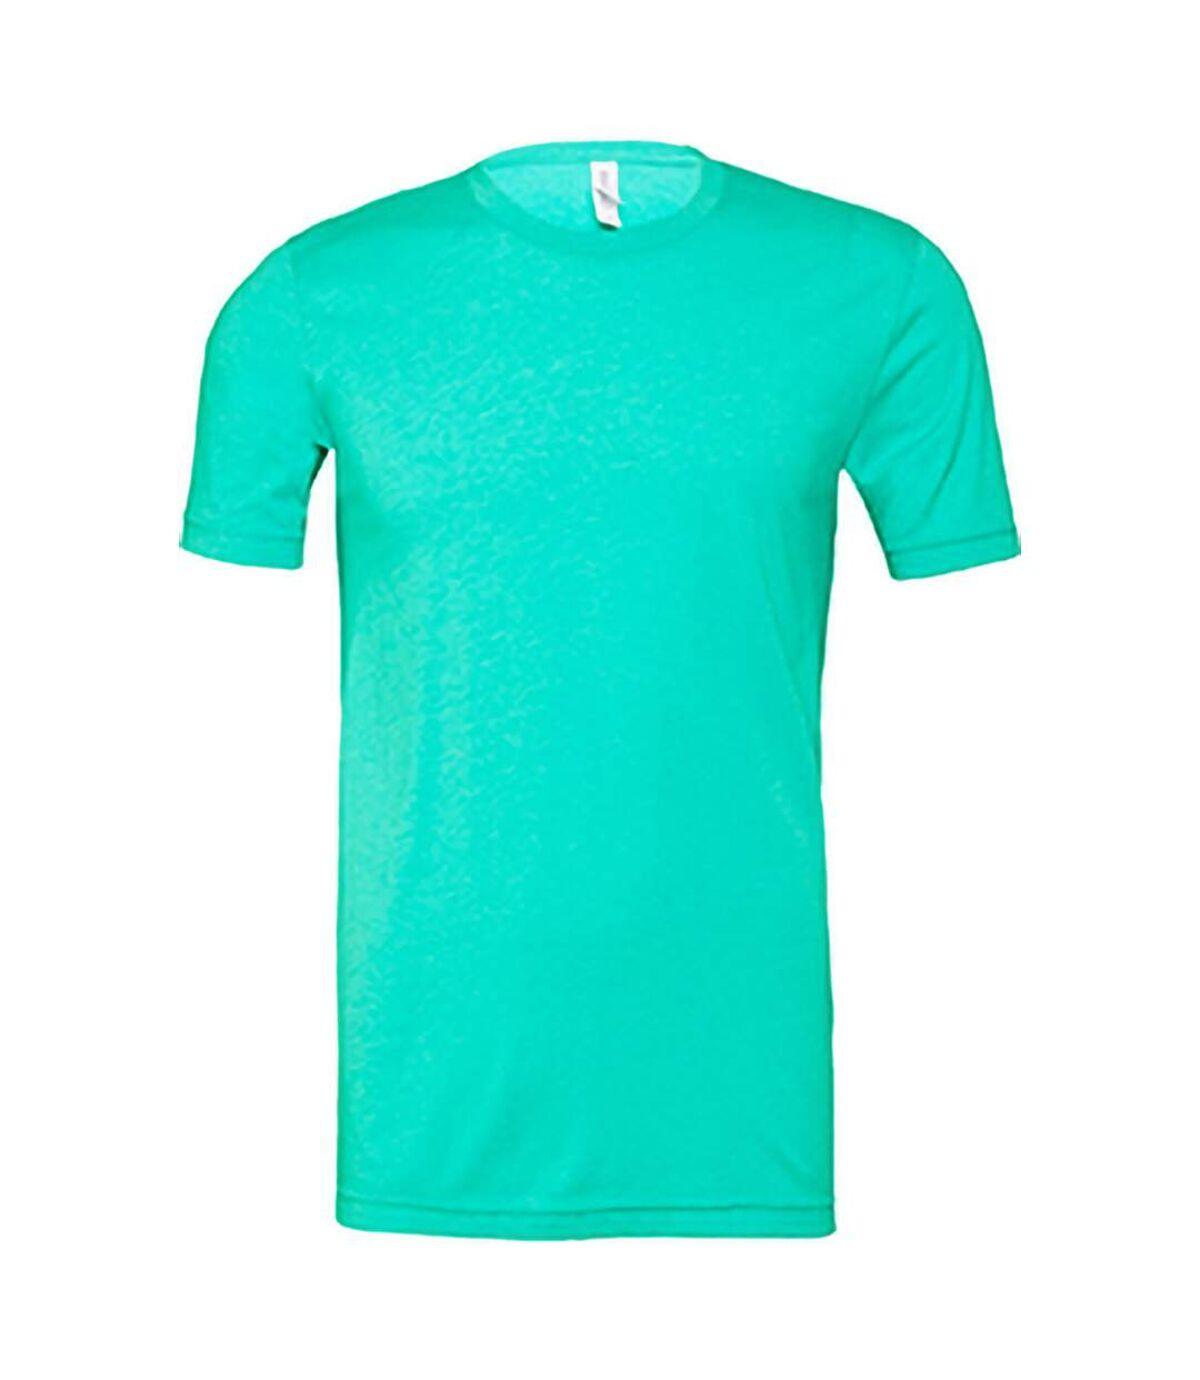 Canvas Unisex Jersey Crew Neck T-Shirt / Mens Short Sleeve T-Shirt (Heather Sea Green) - UTBC163